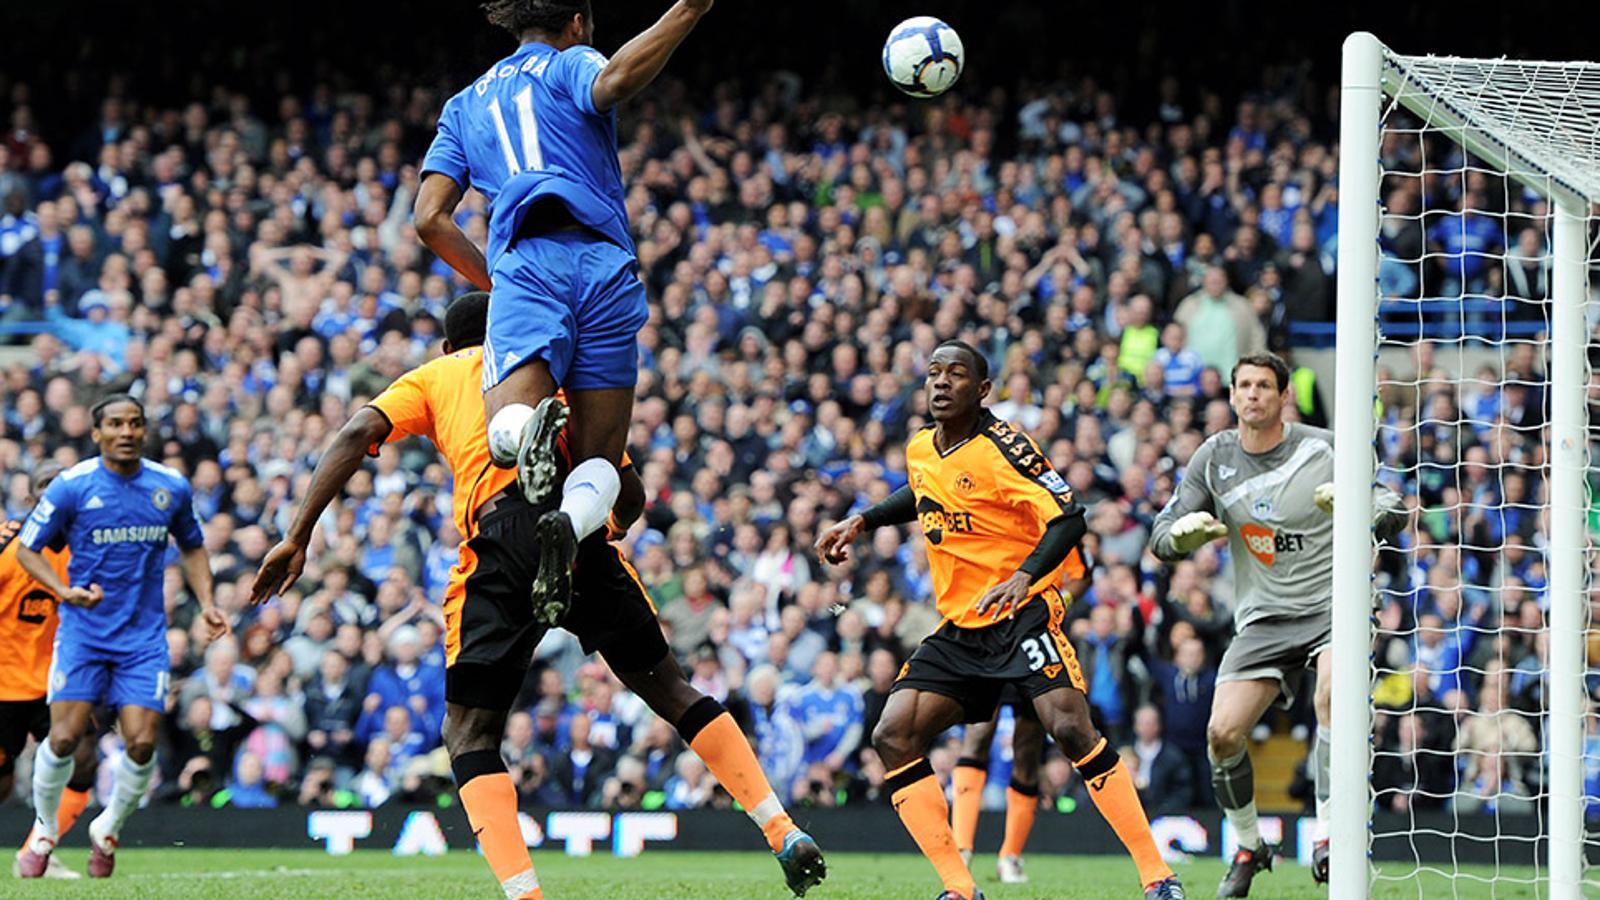 2009/10 Premier League Years